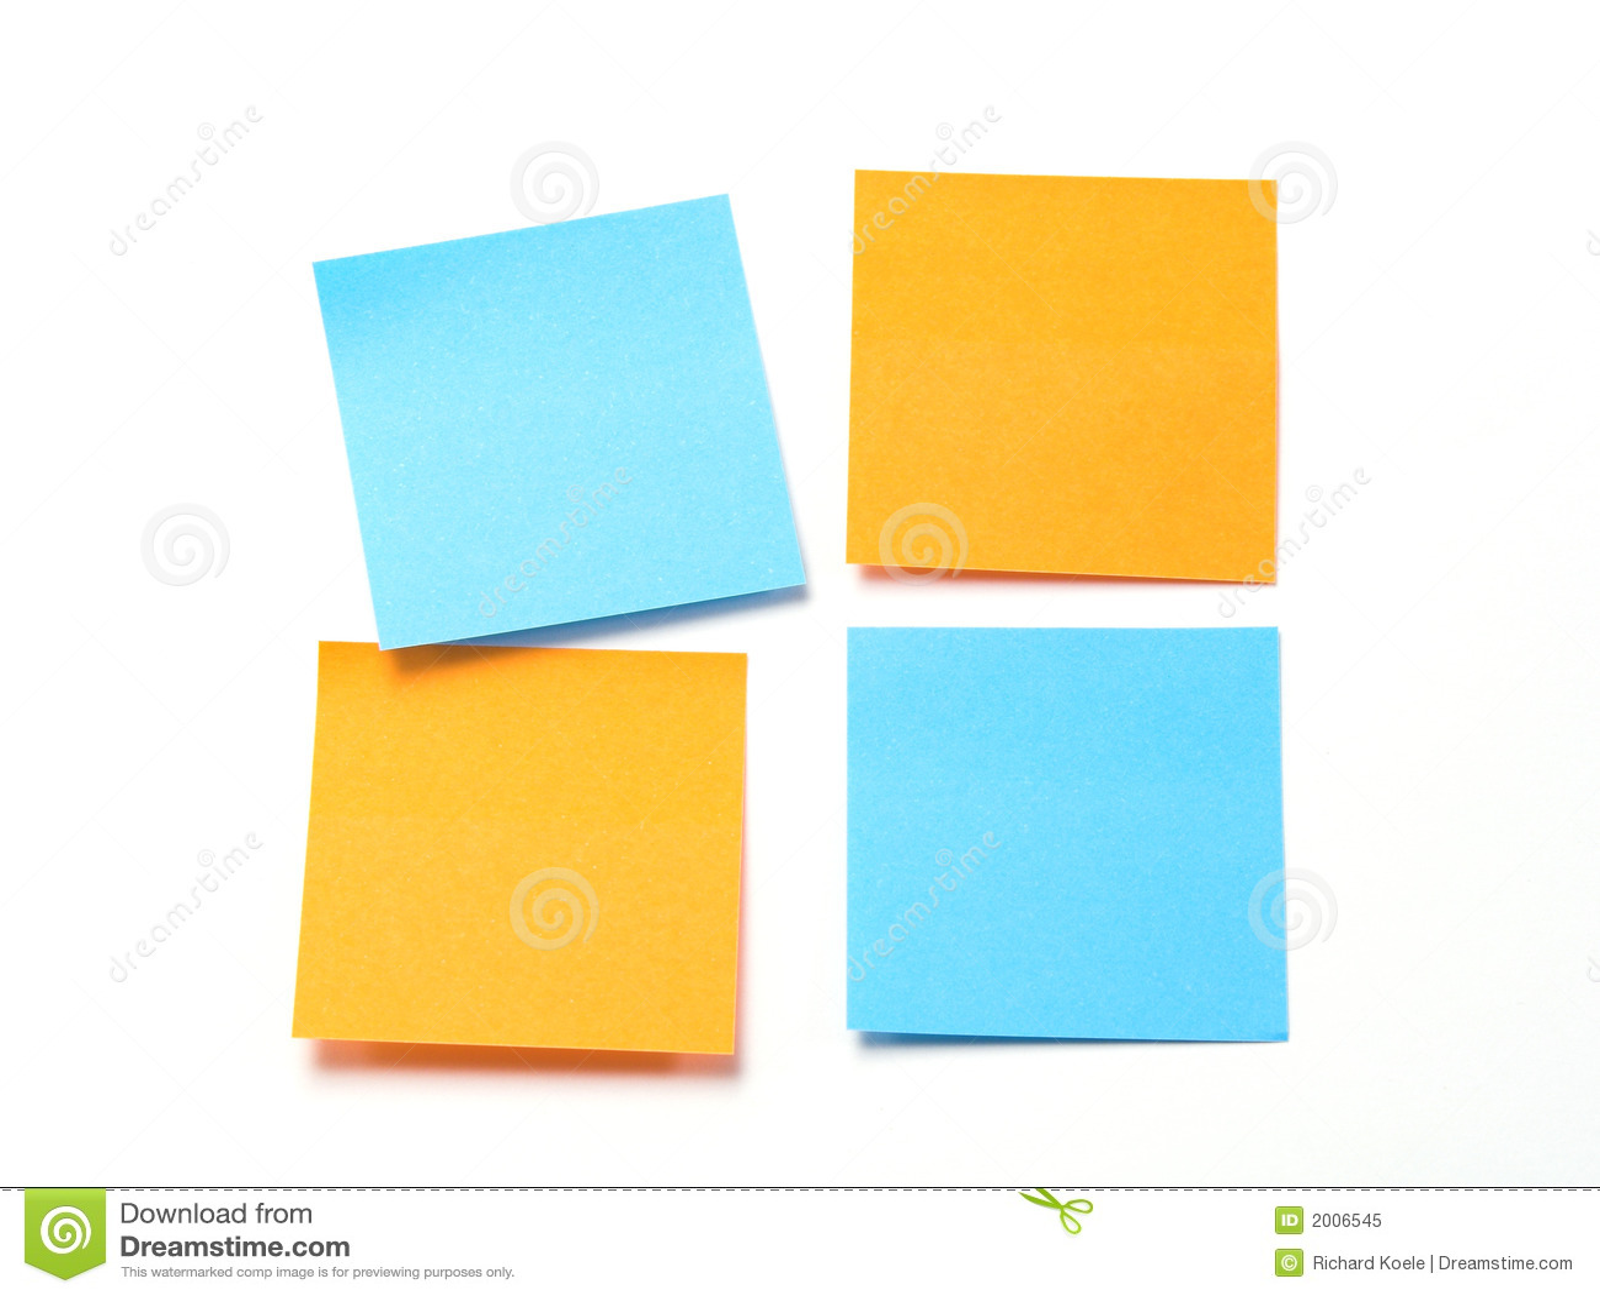 Blue Sticky Notes Stock Image - Image: 4359191